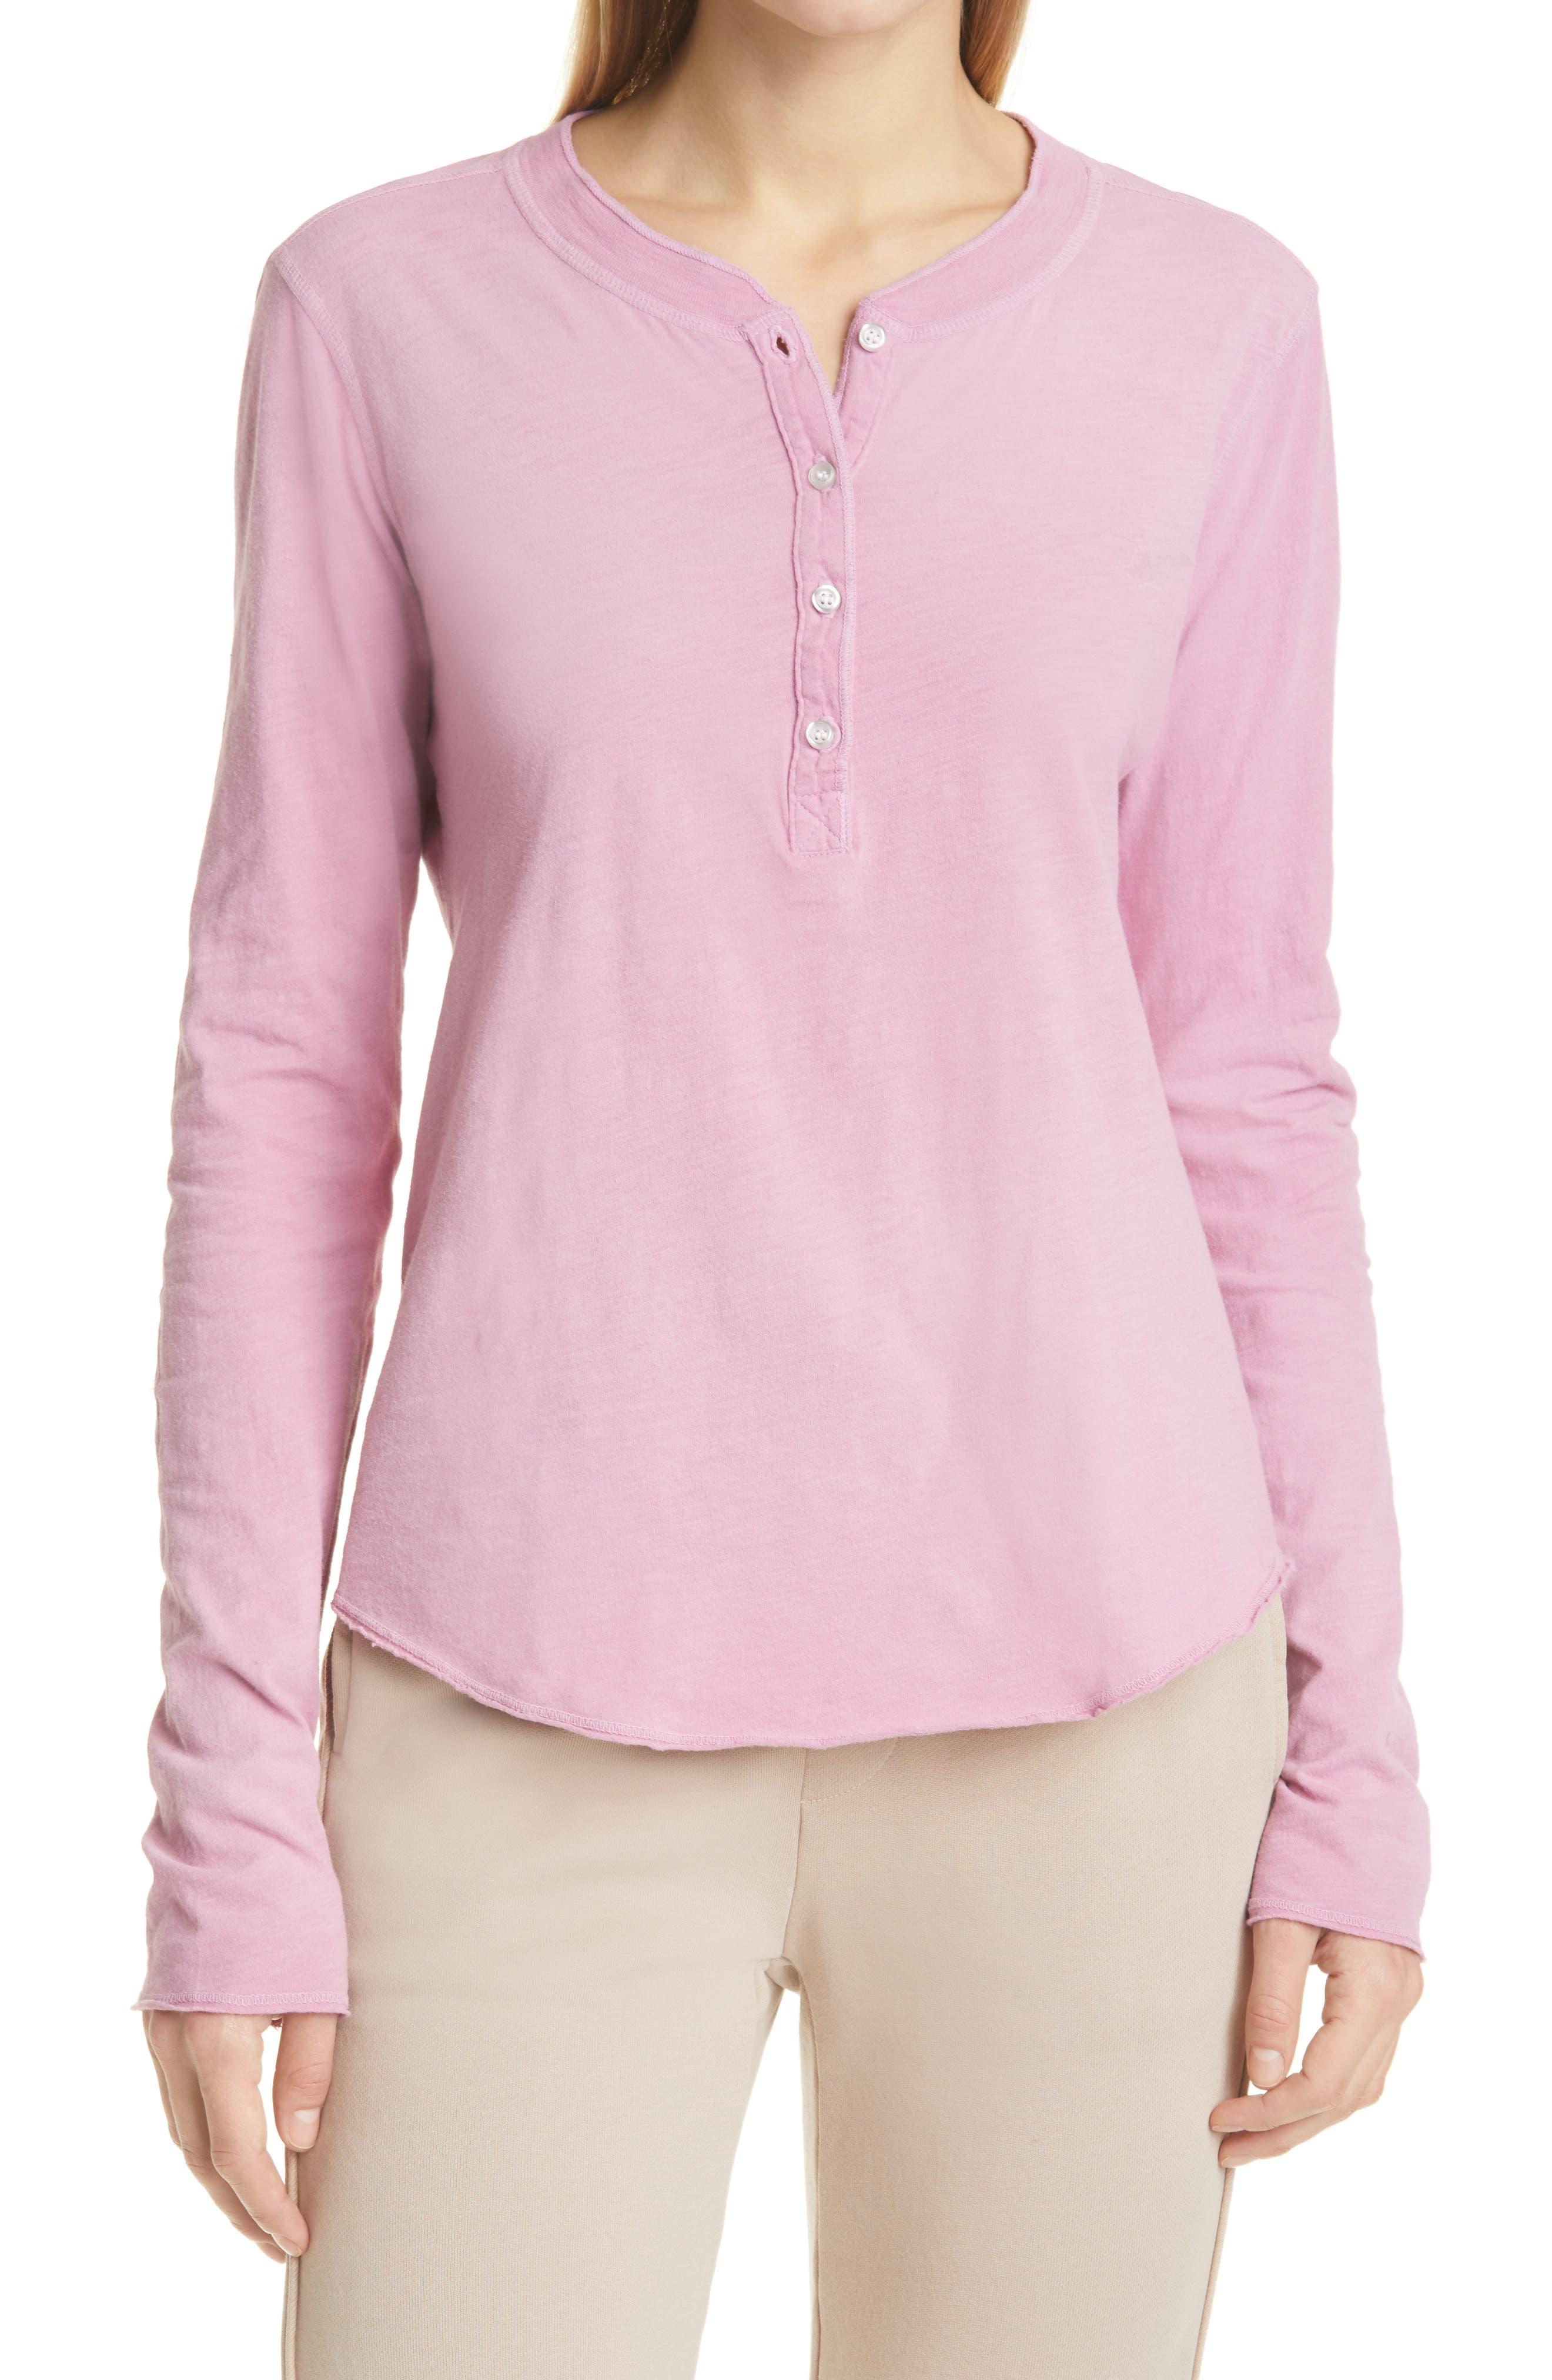 NSF Clothing Women's Nsf Clothing Hal Women's Henley Top, Size Petite - Pink